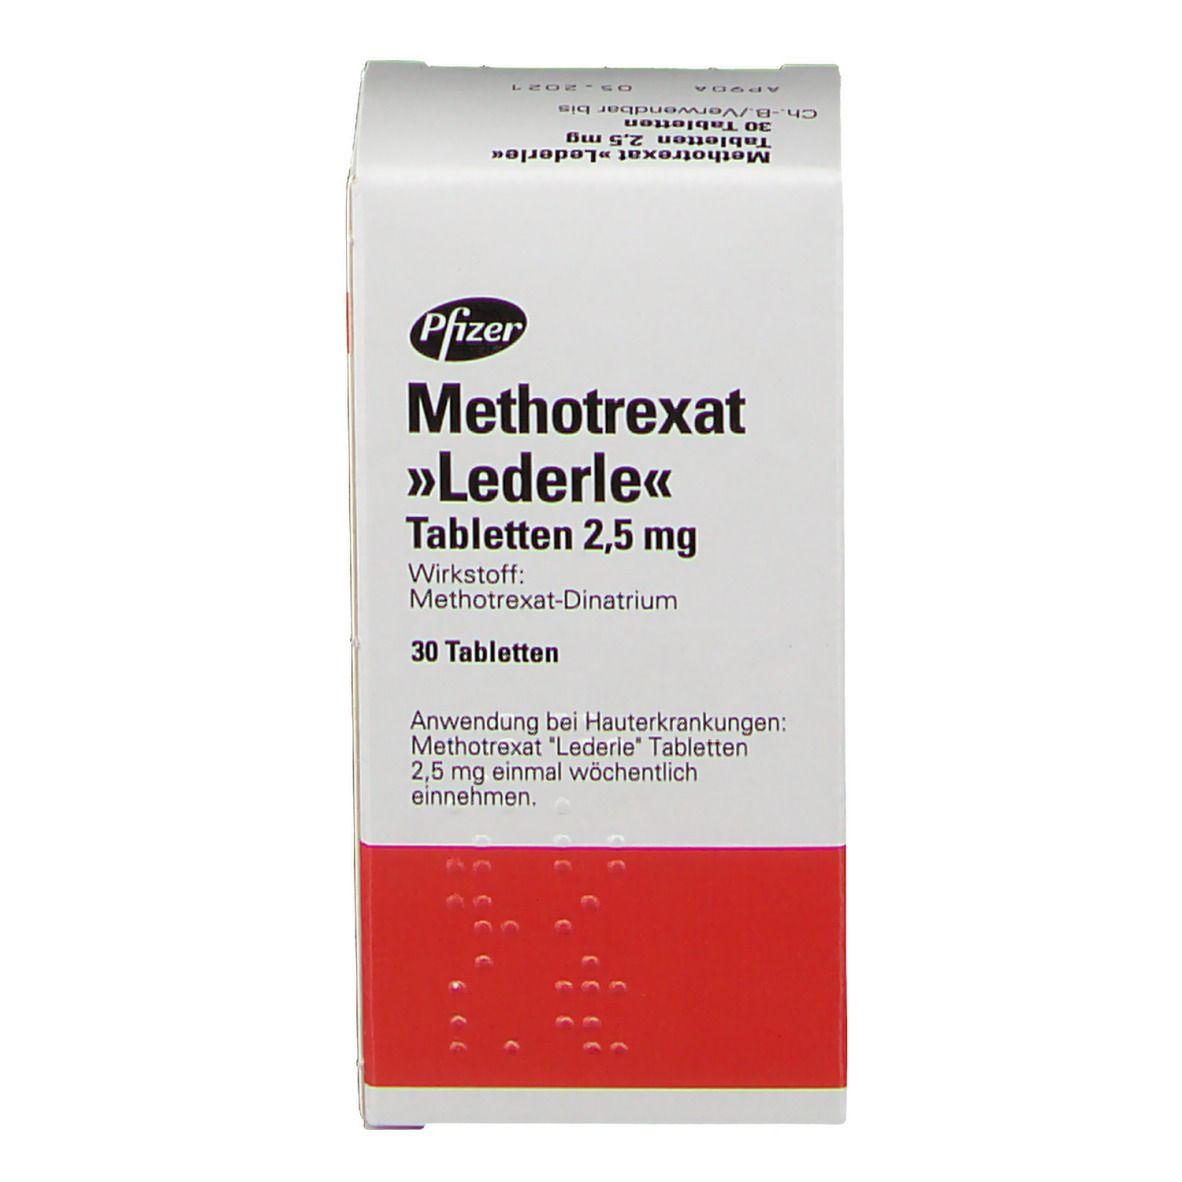 Methotrexat Lederle 2,5 mg Tabl.